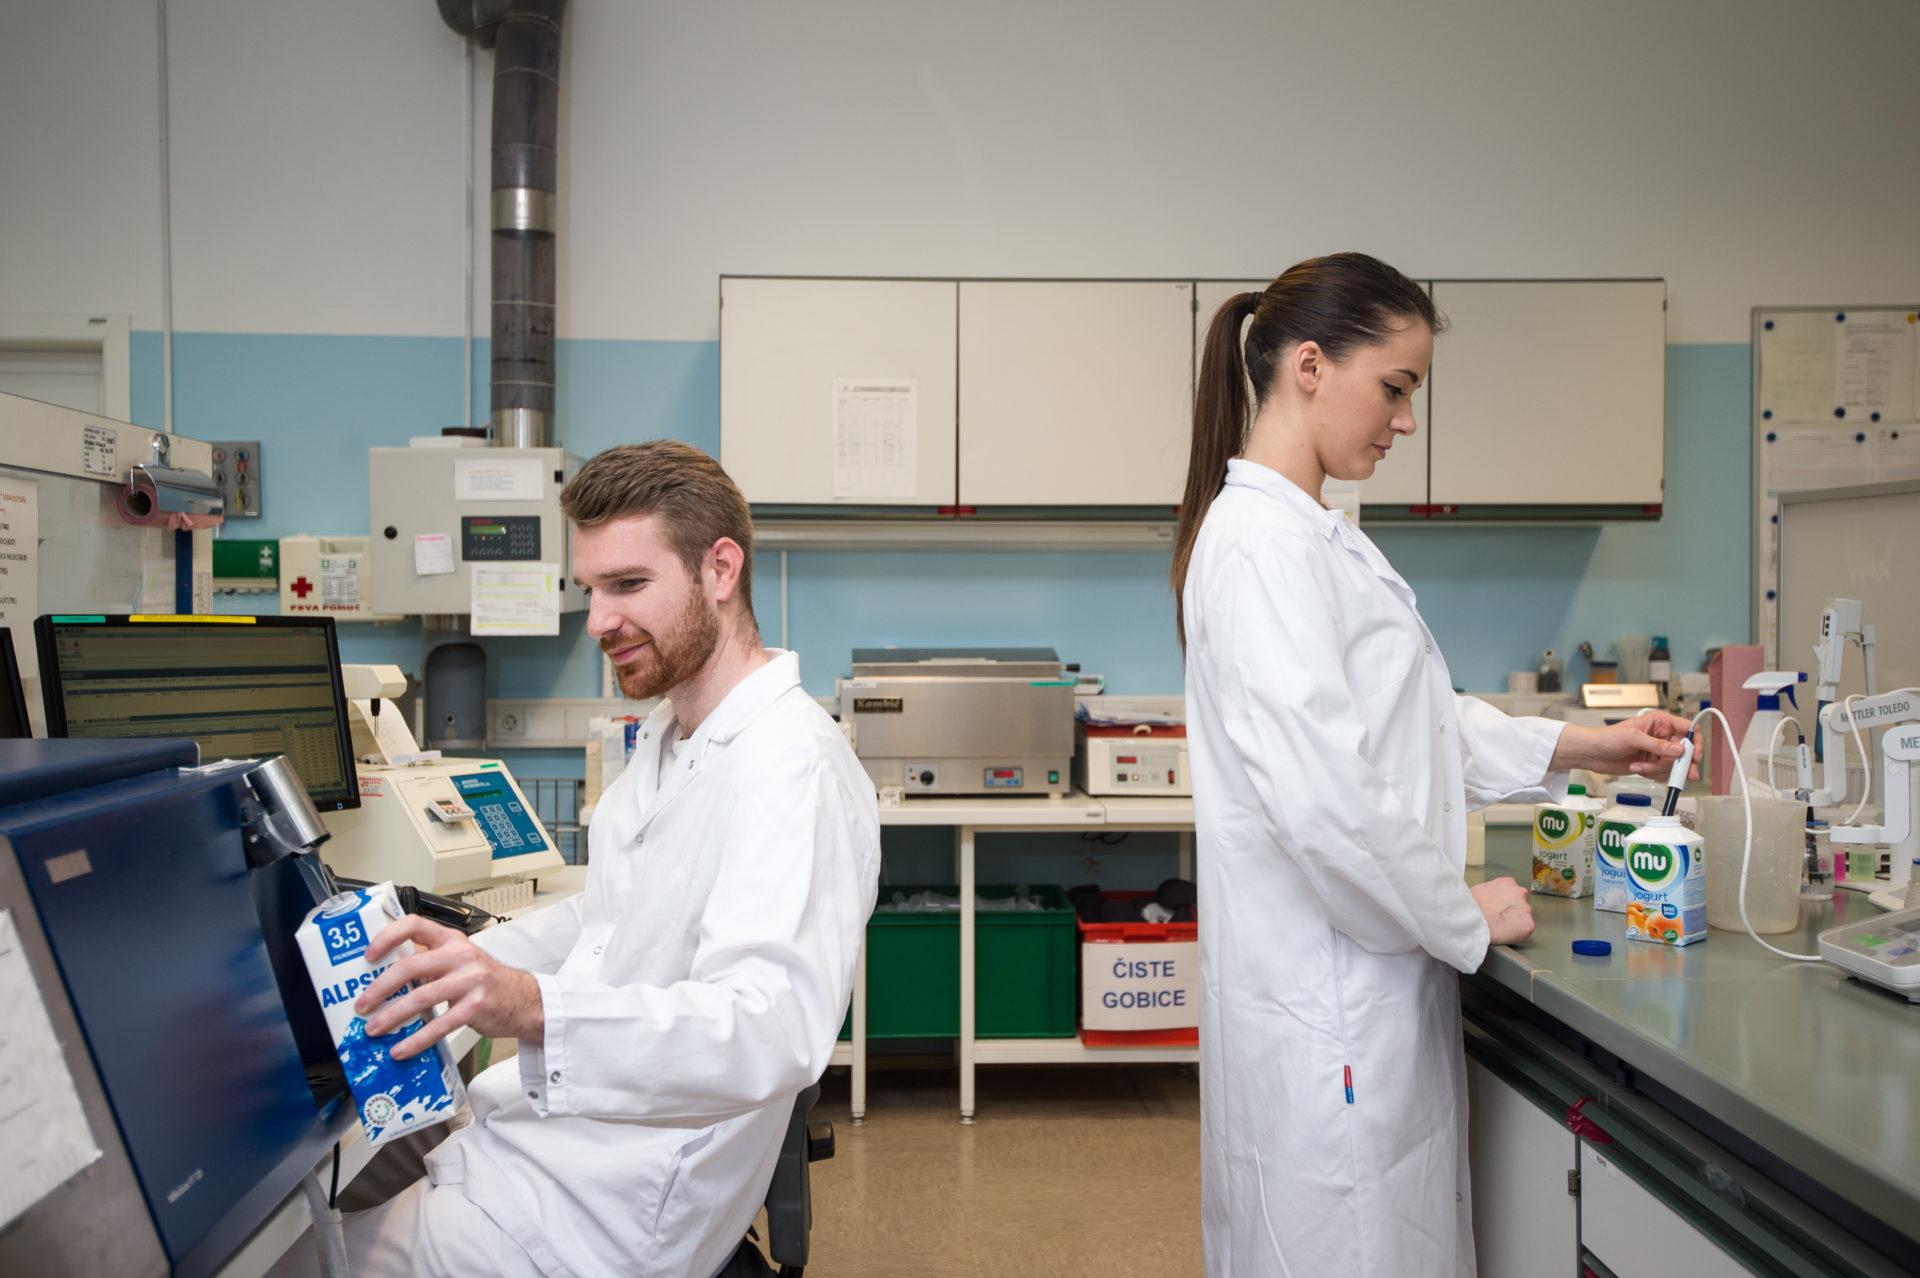 laboratorij, zaposlitev, kadri